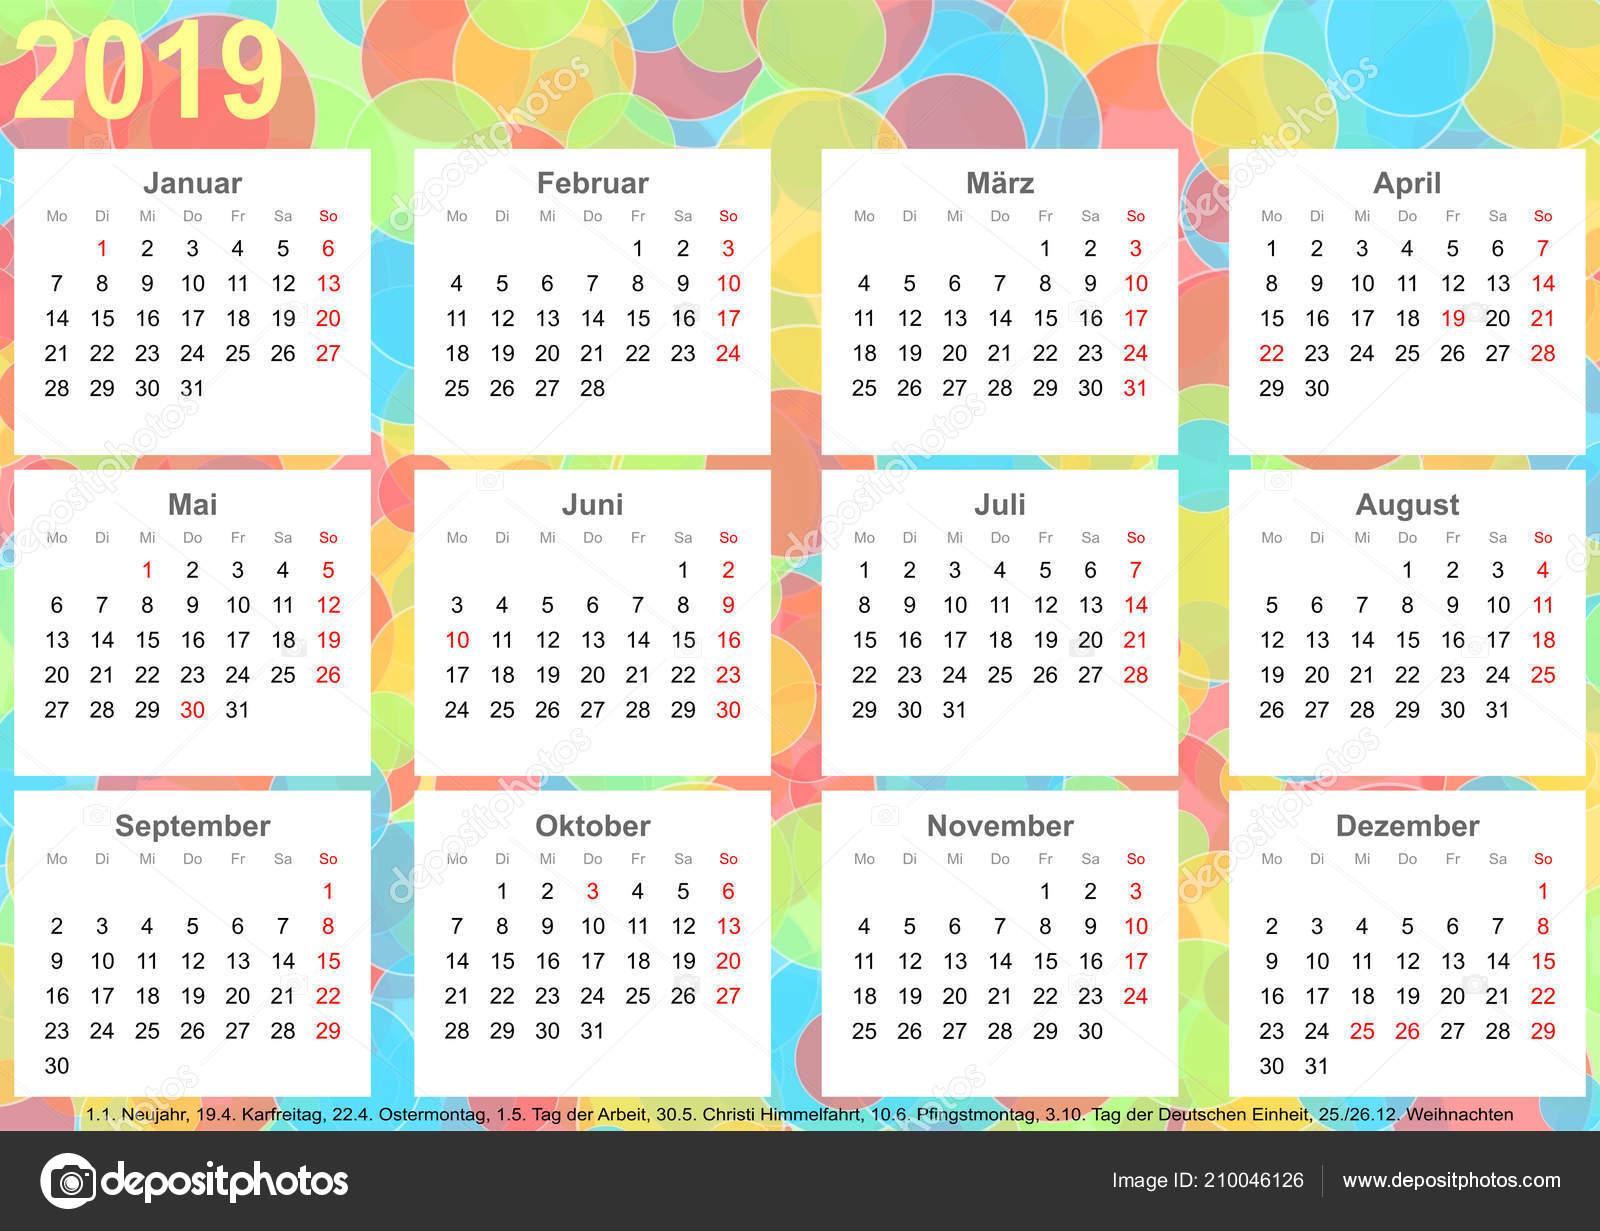 Calendario Con Giorni Festivi.Foto Calendario 2019 Sfondo Calendario 2019 Con Cerchi